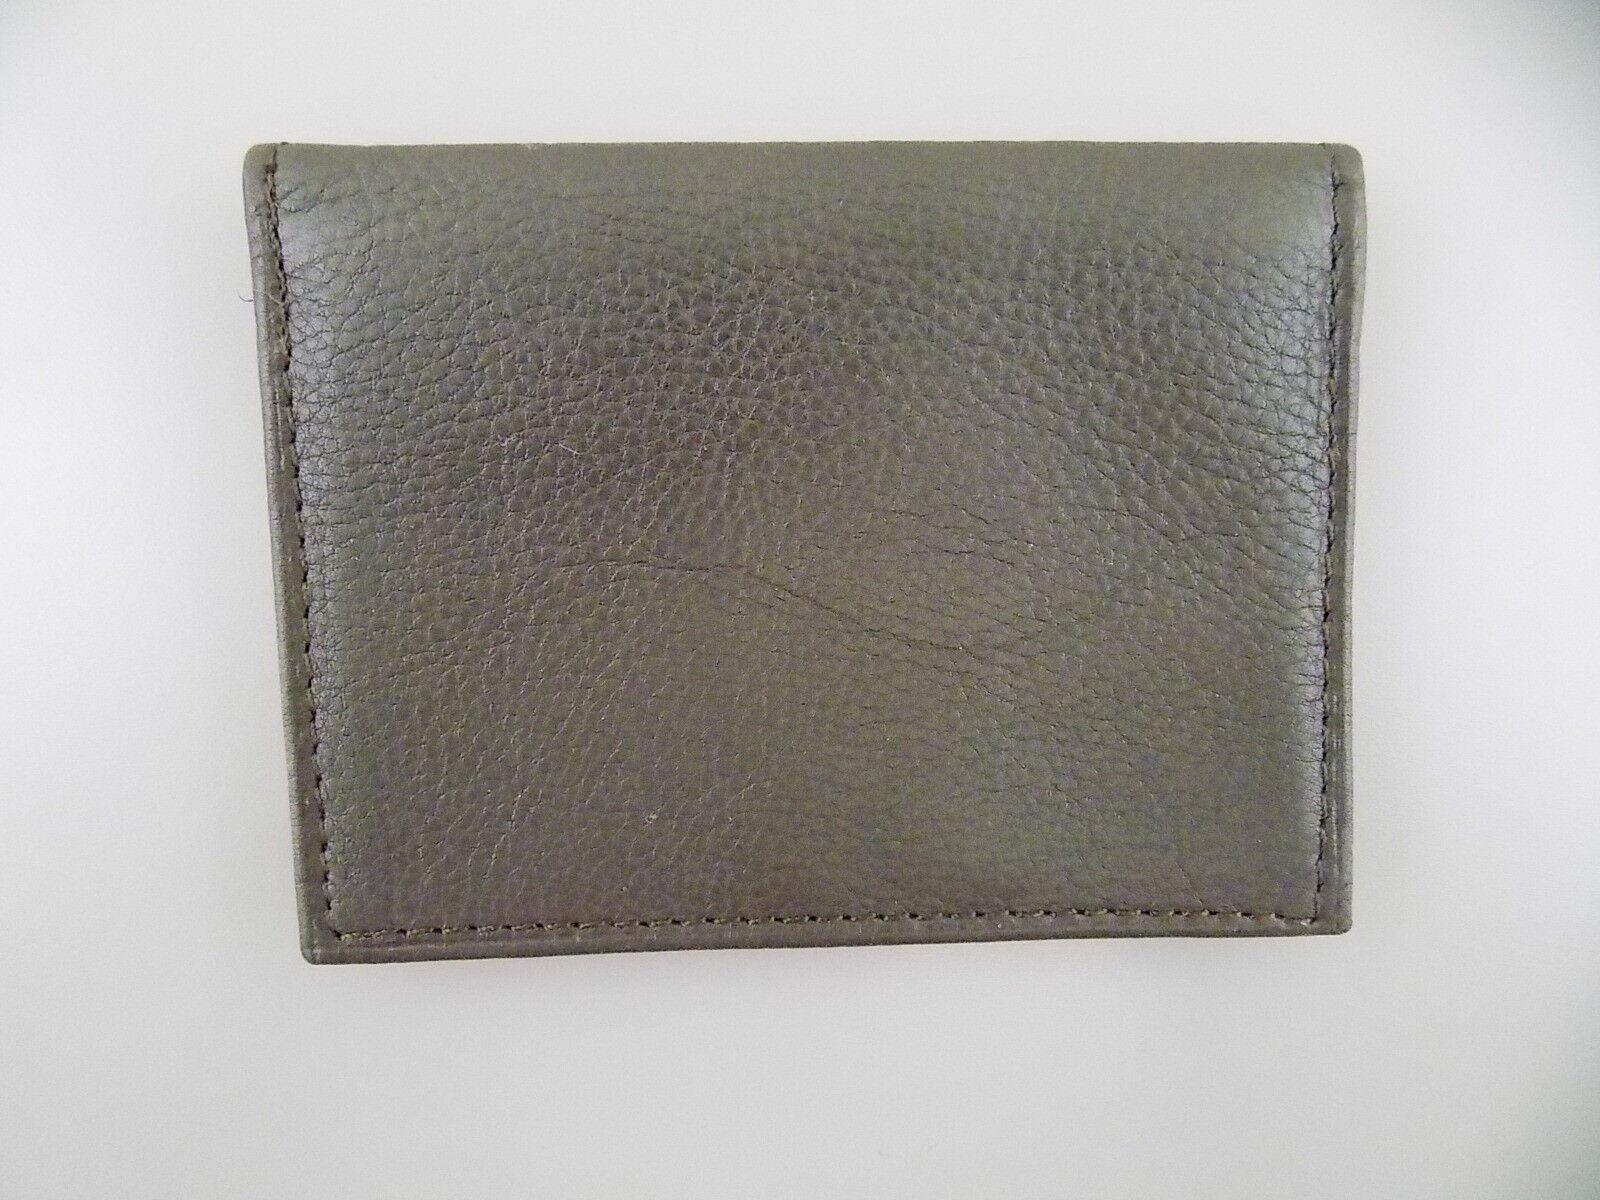 Tasso Elba Brown ID Wallet MEN'S Leather Wallet SLIM FOLD P16